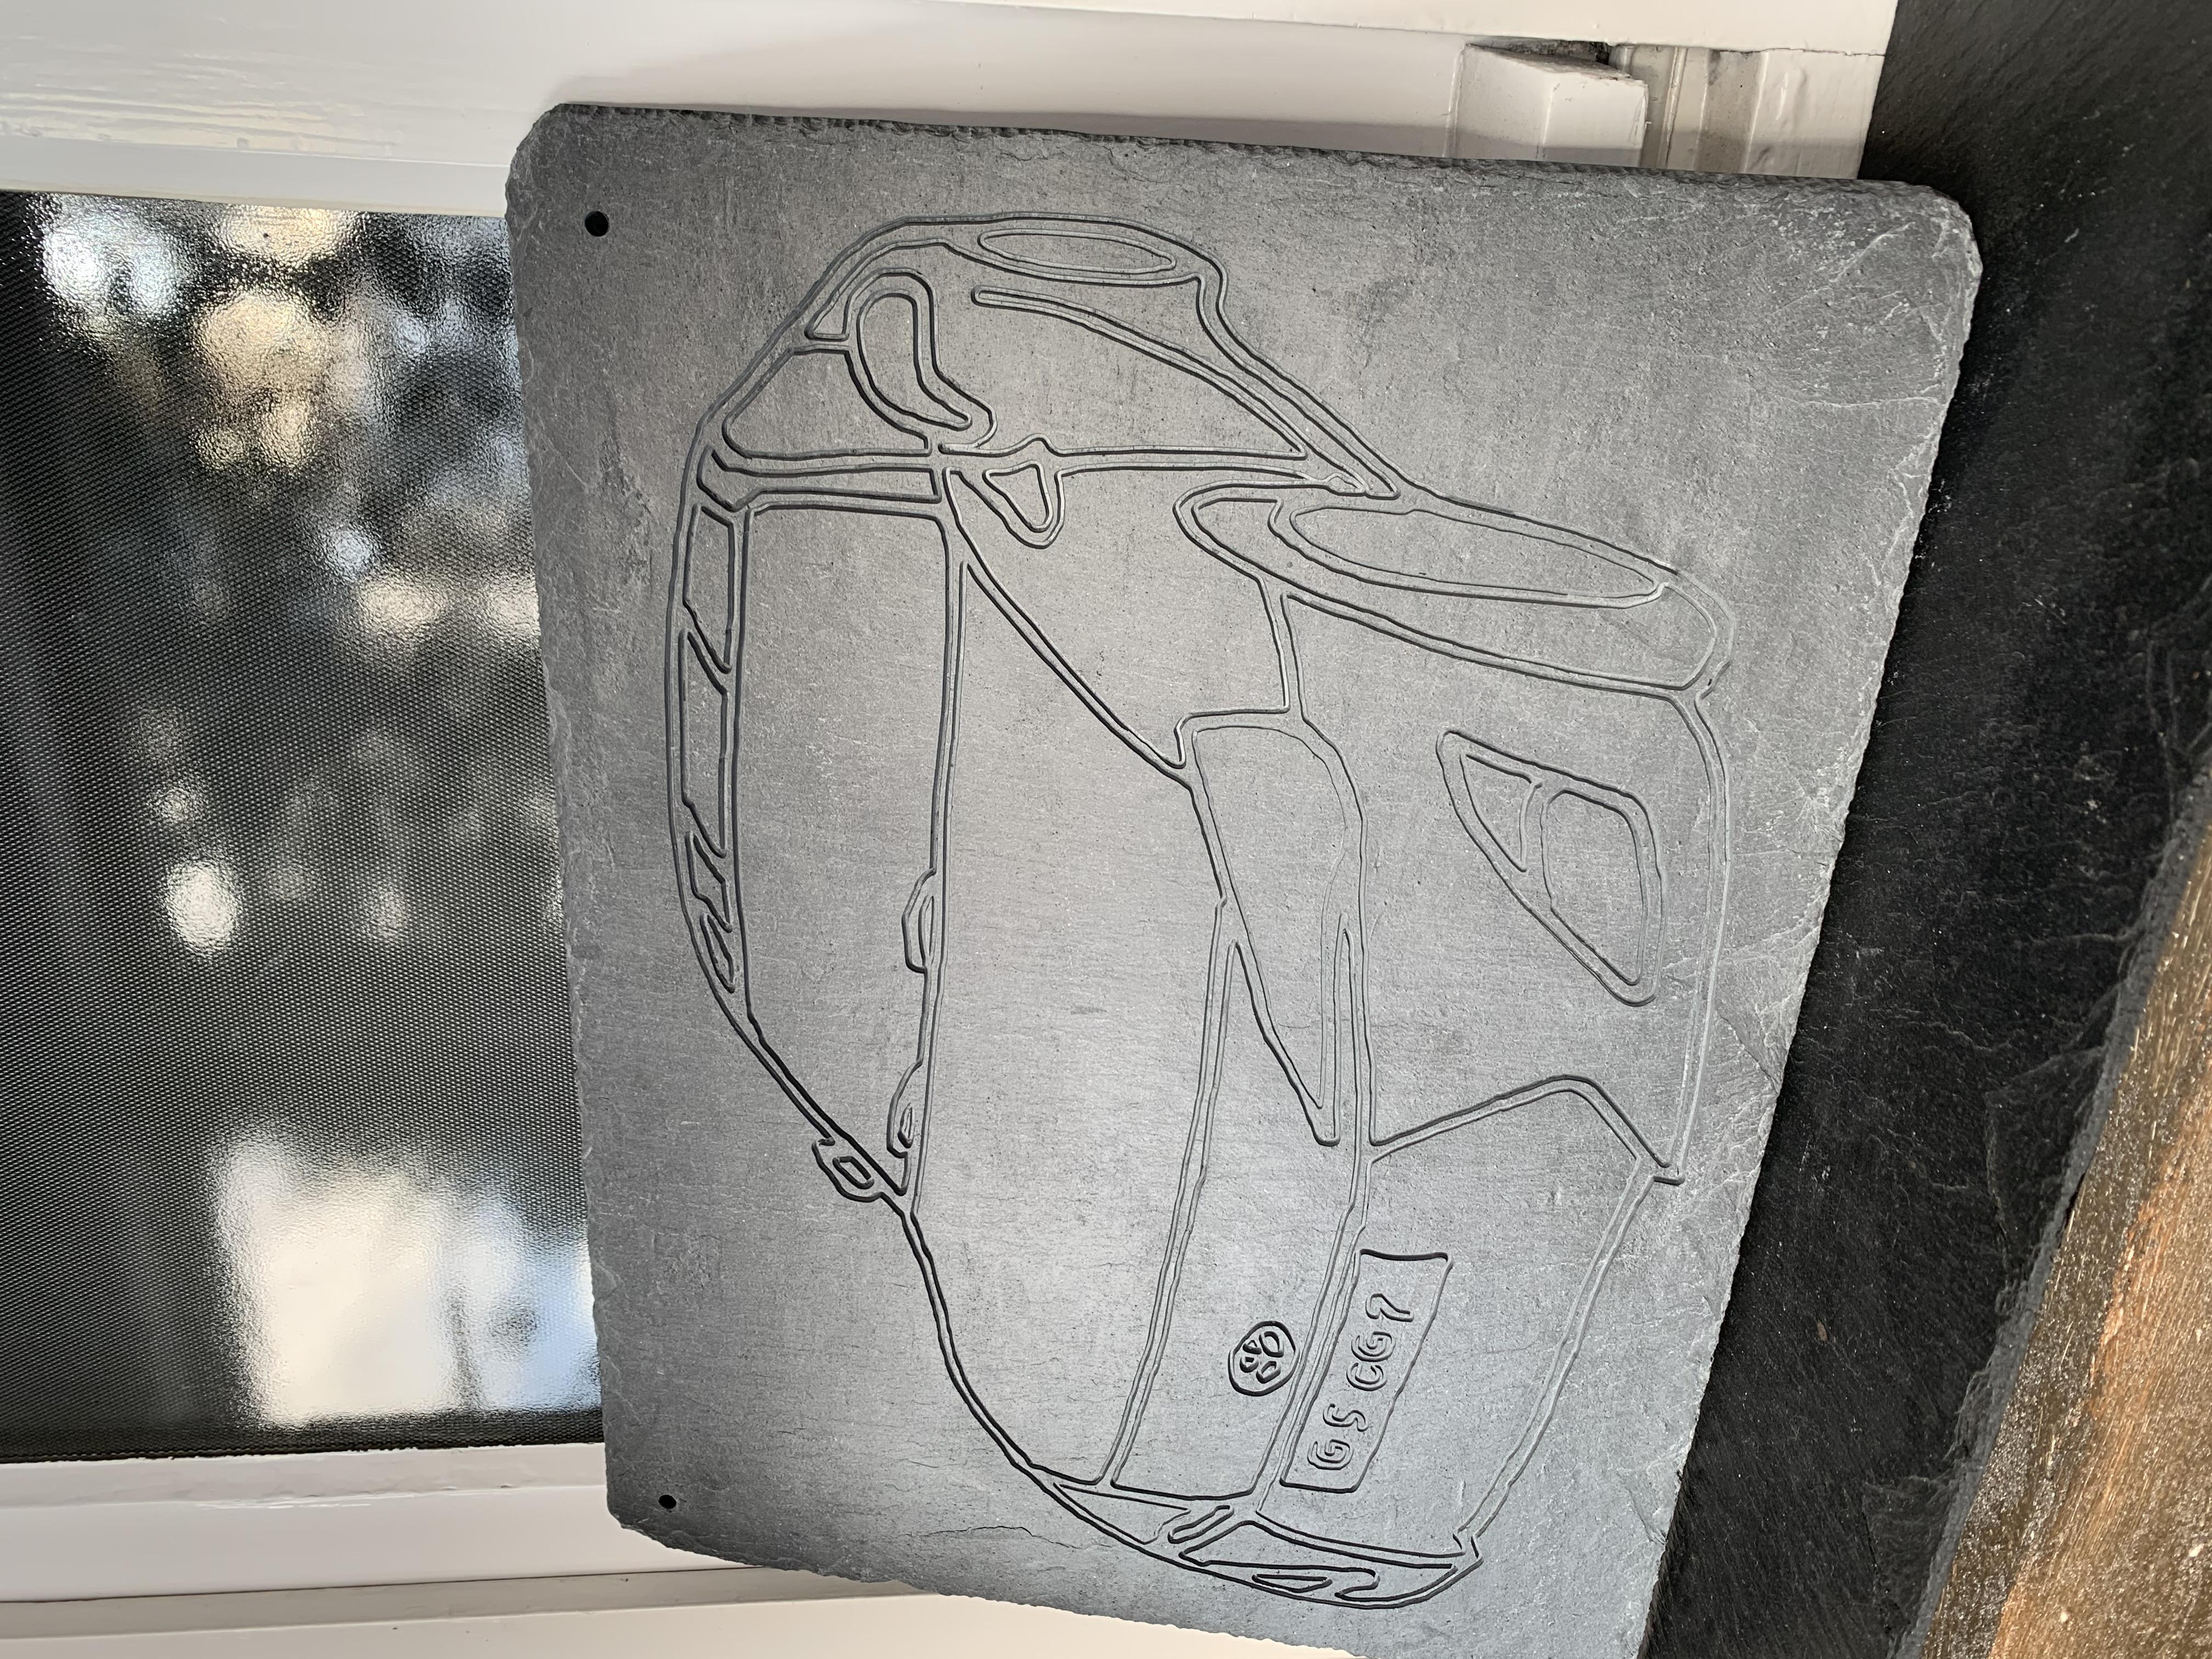 Tiefengravur in Schieferplatte